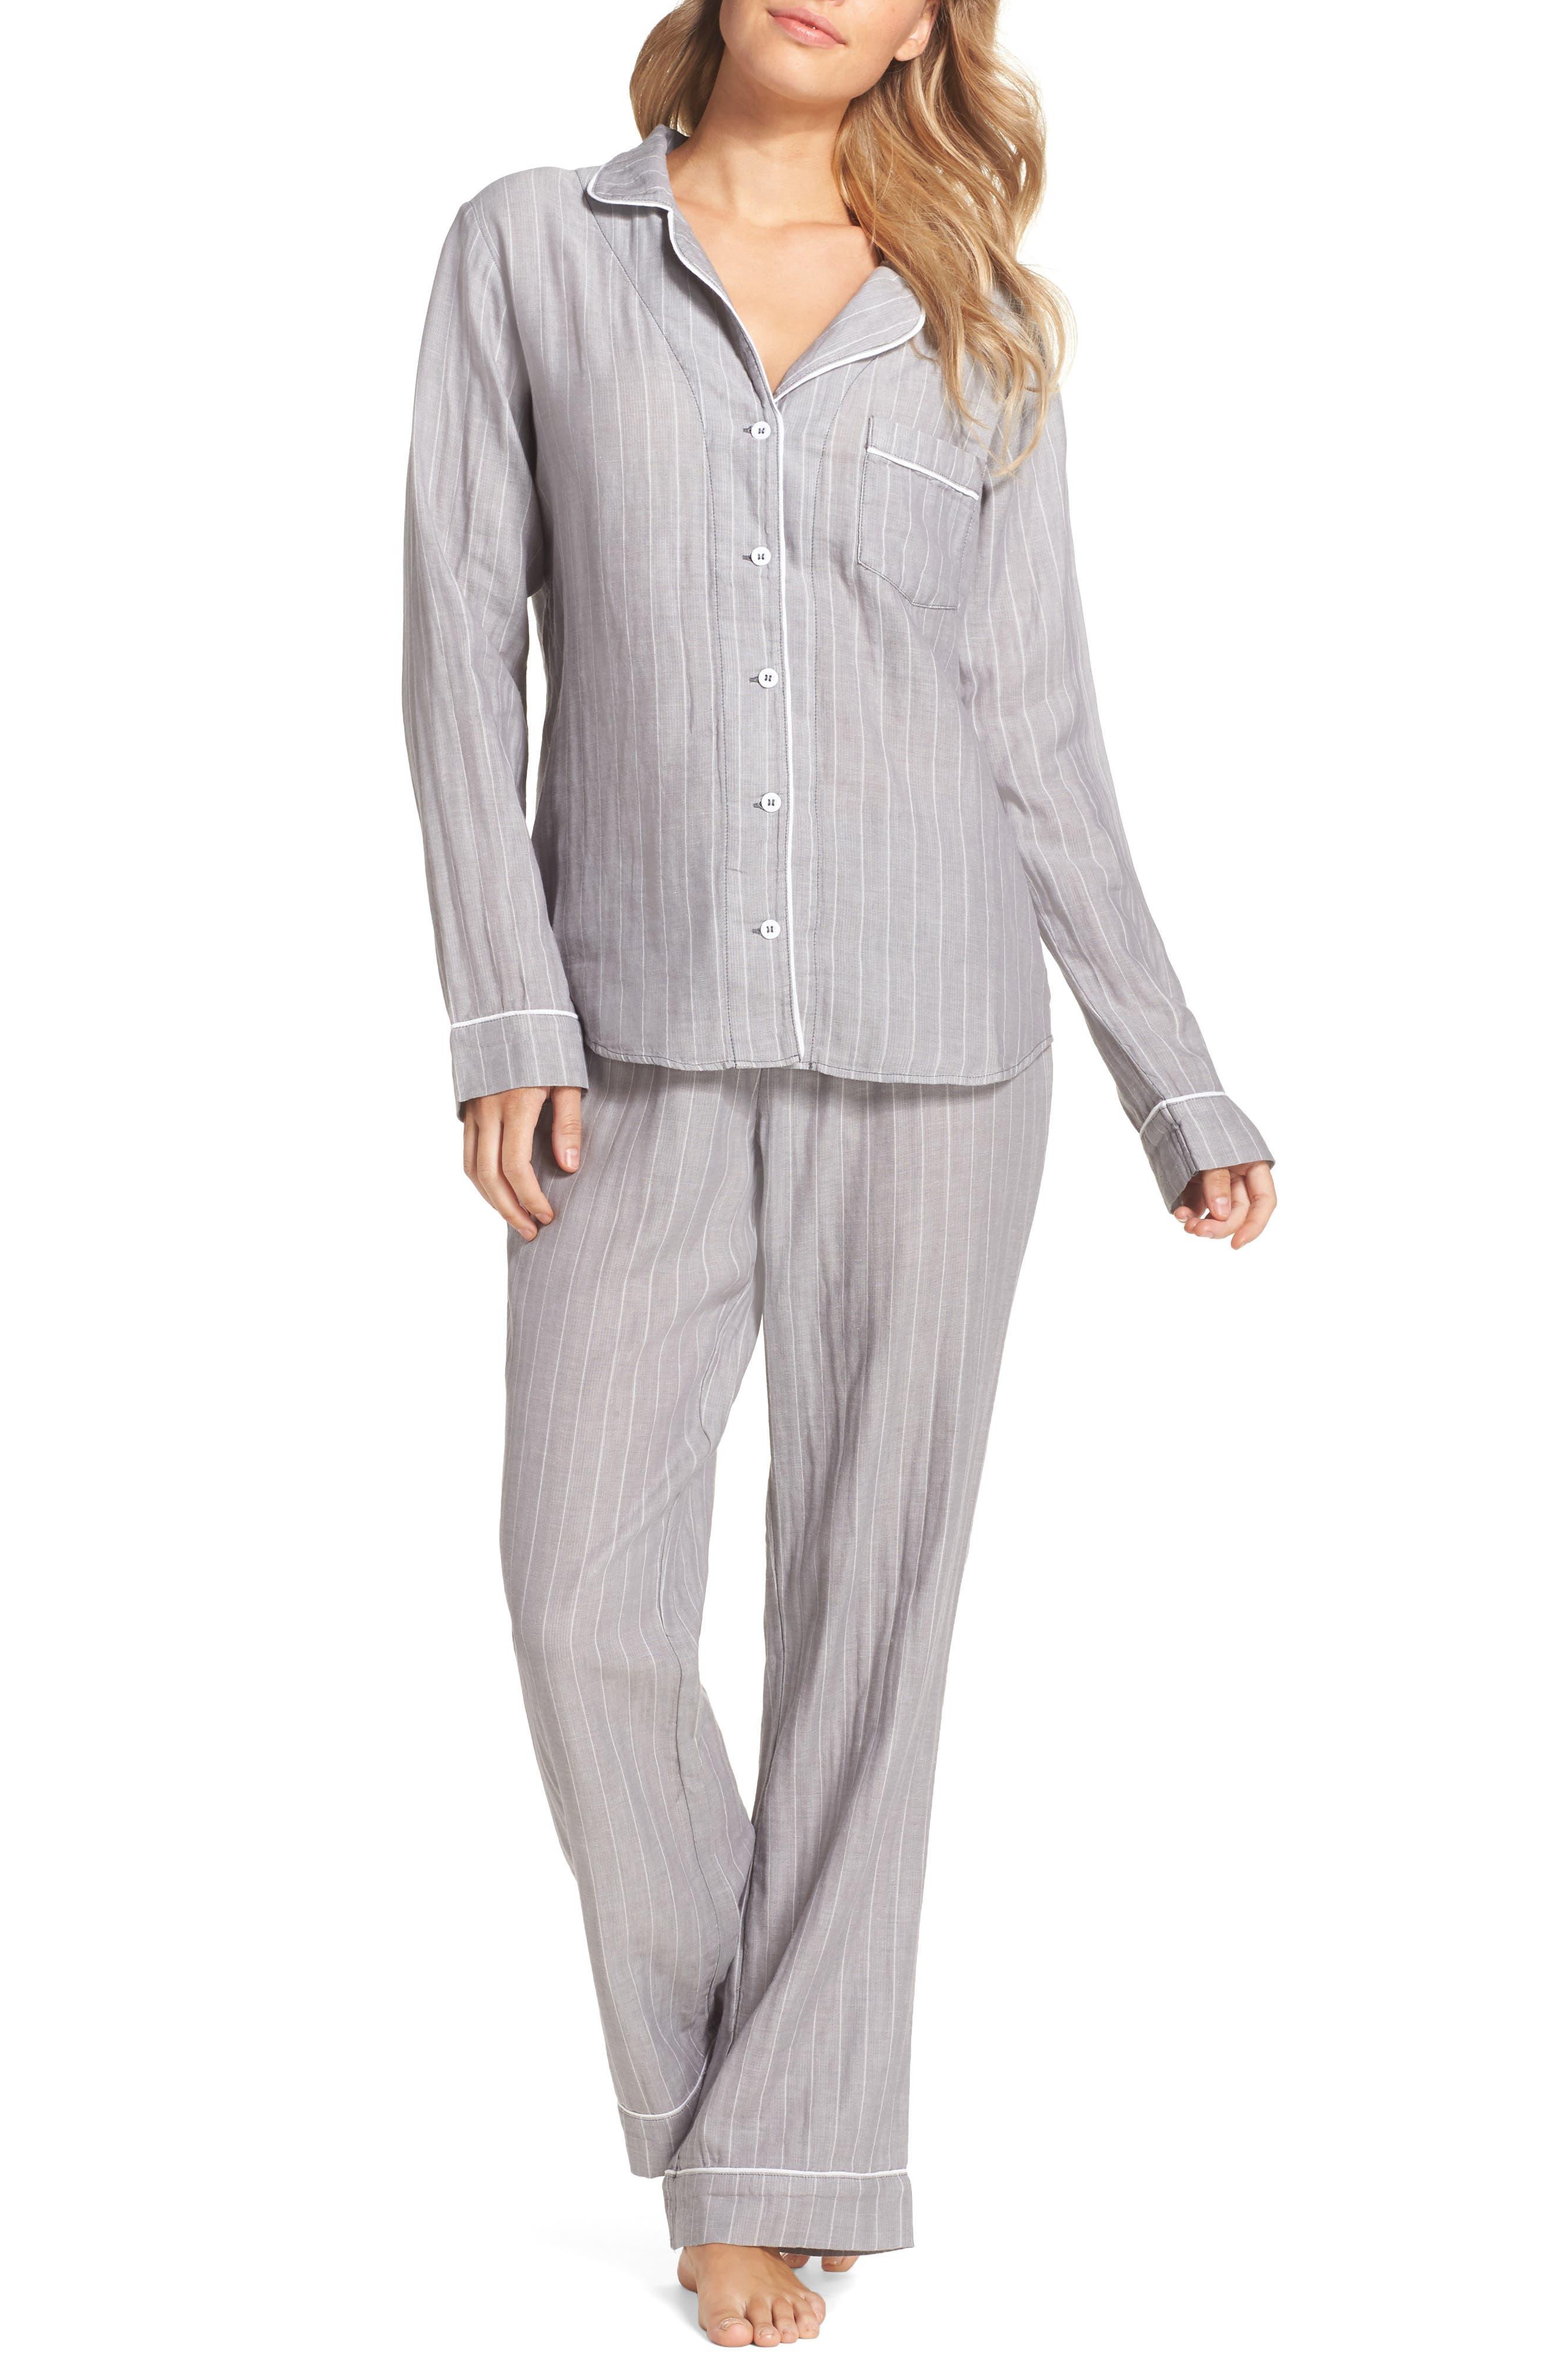 Raven Stripe Pajamas,                         Main,                         color, 020